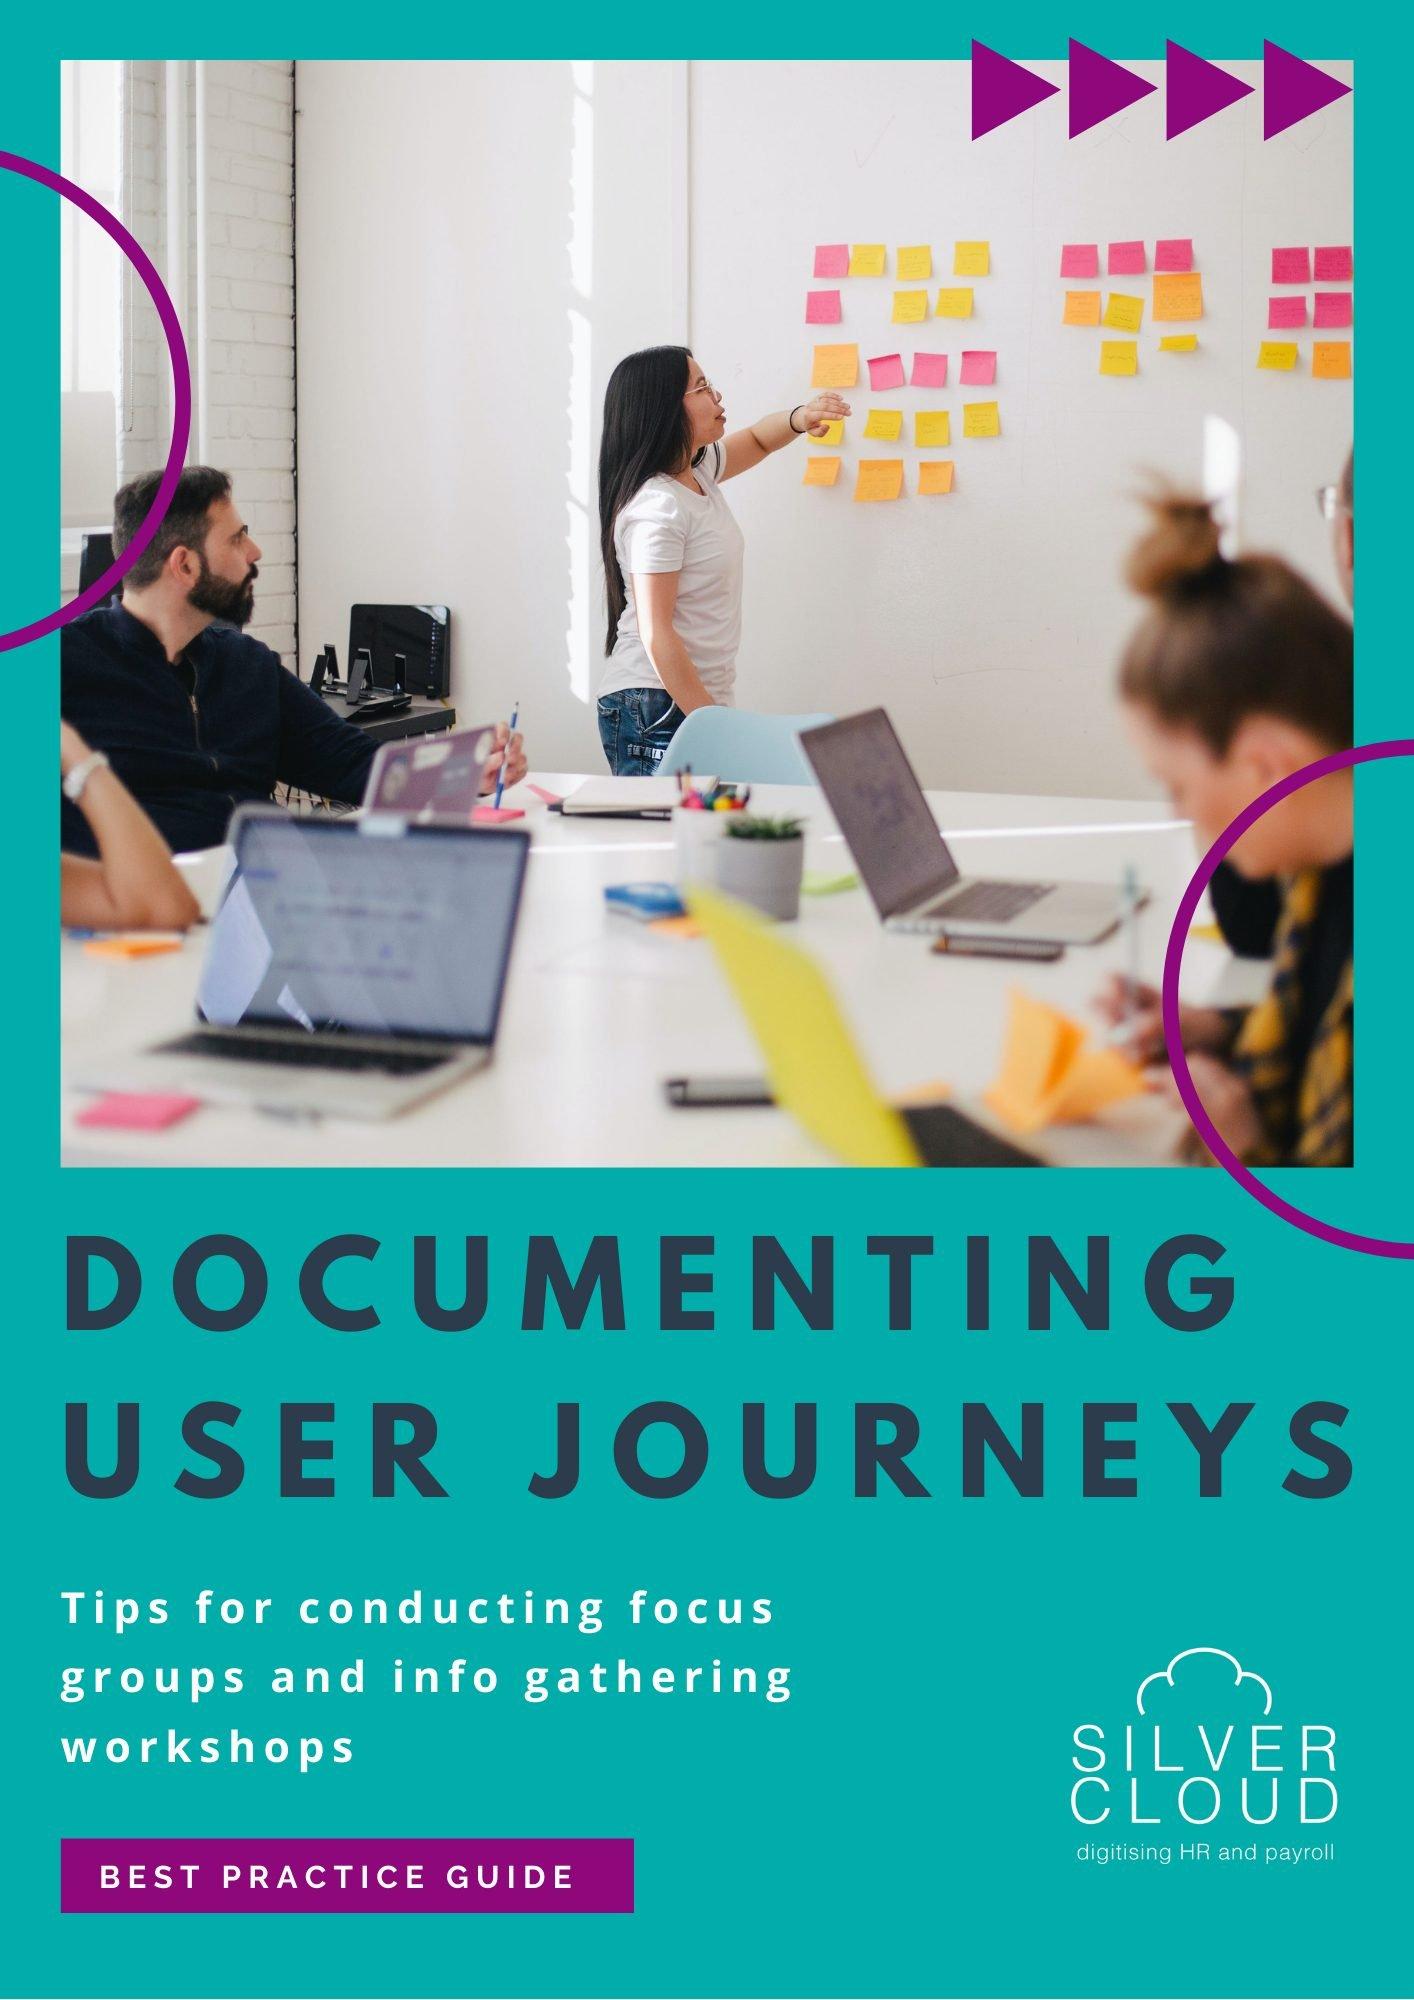 Documenting User Journeys - Best Practice Guide